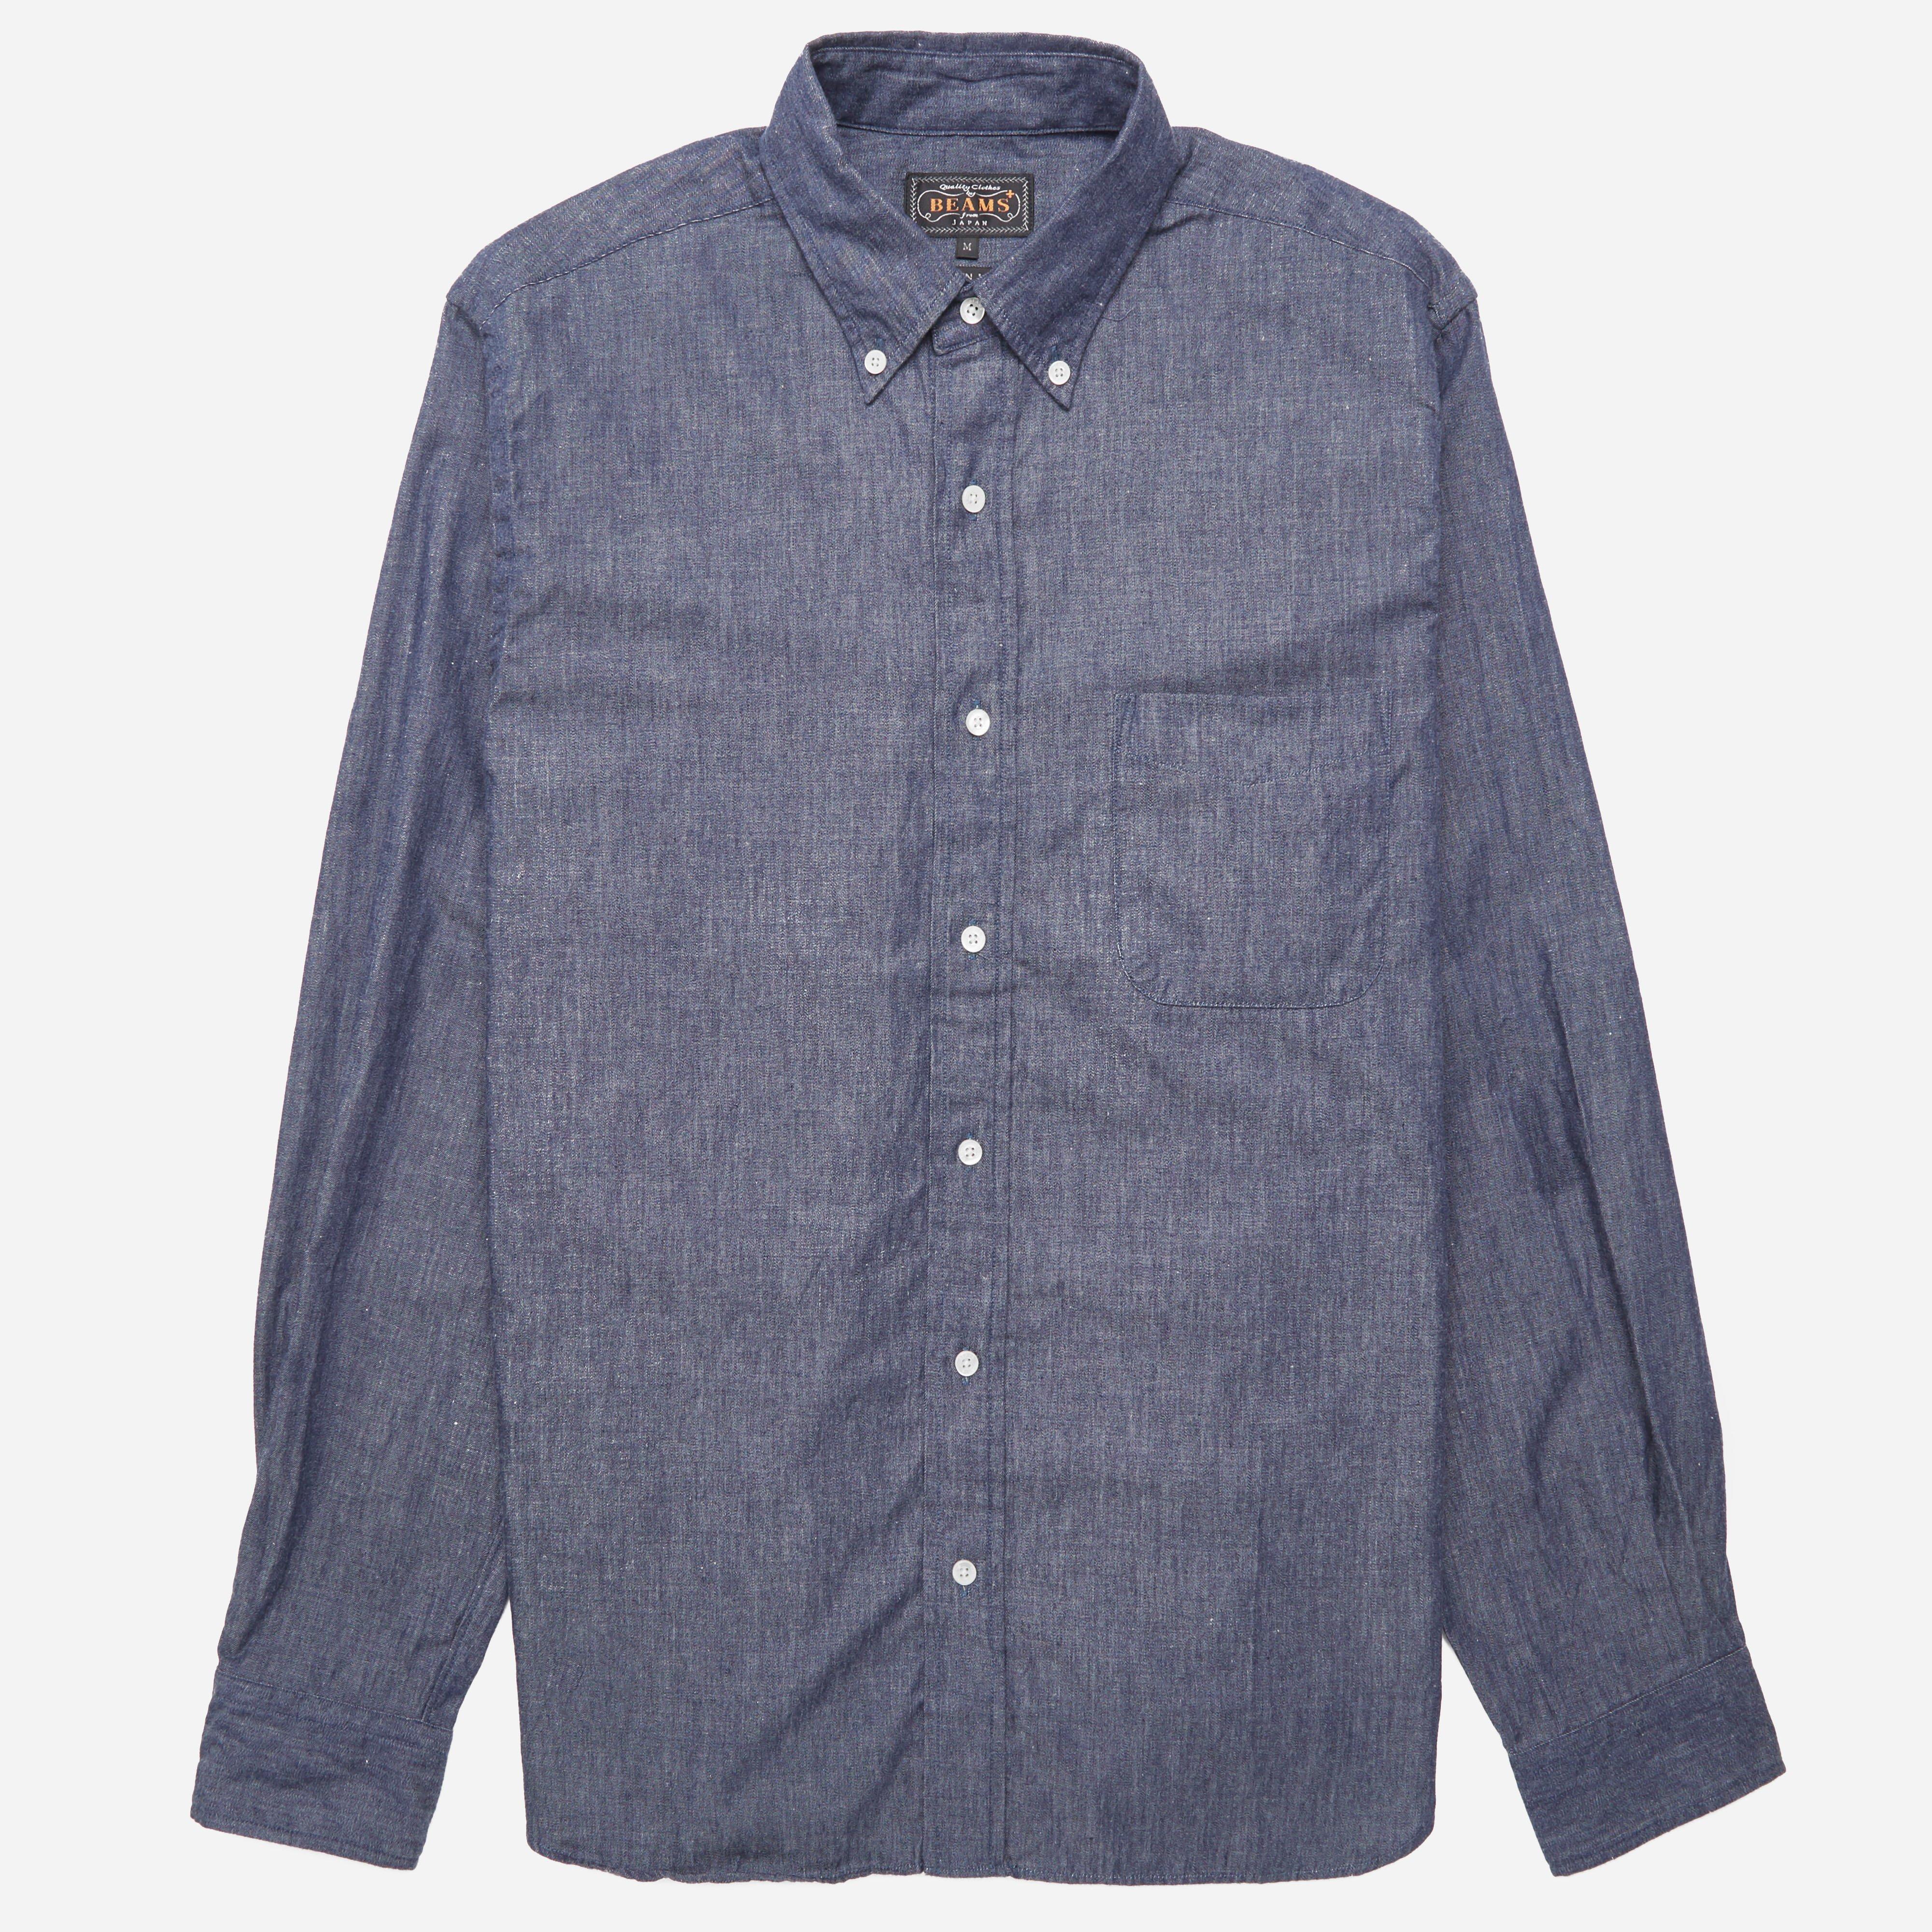 Beams Plus Button Down Denim Shirt